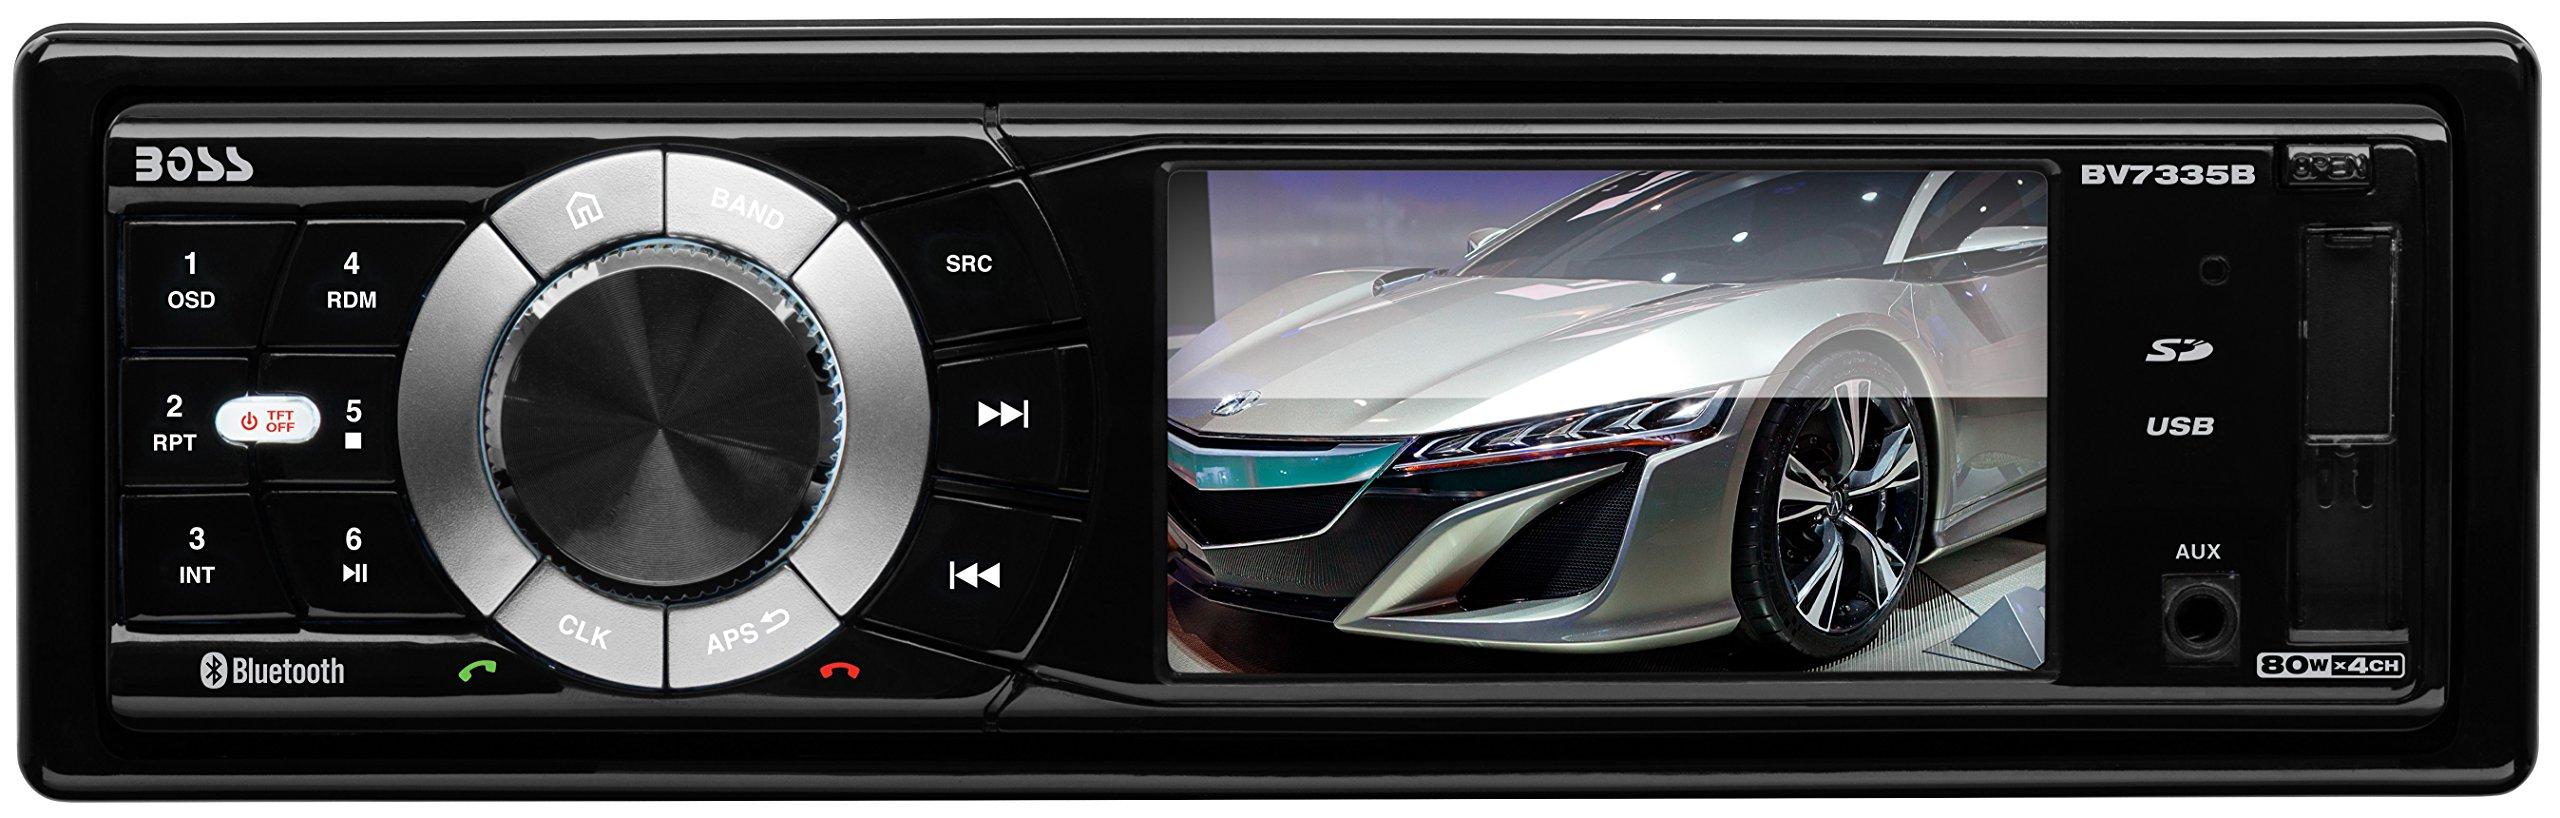 BOSS Audio BV7335B Single Din, Bluetooth, DVD/CD/MP3/USB/SD AM/FM Car Stereo, 3.2 Inch Digital LCD Monitor, Detachable Front Panel, Wireless Remote